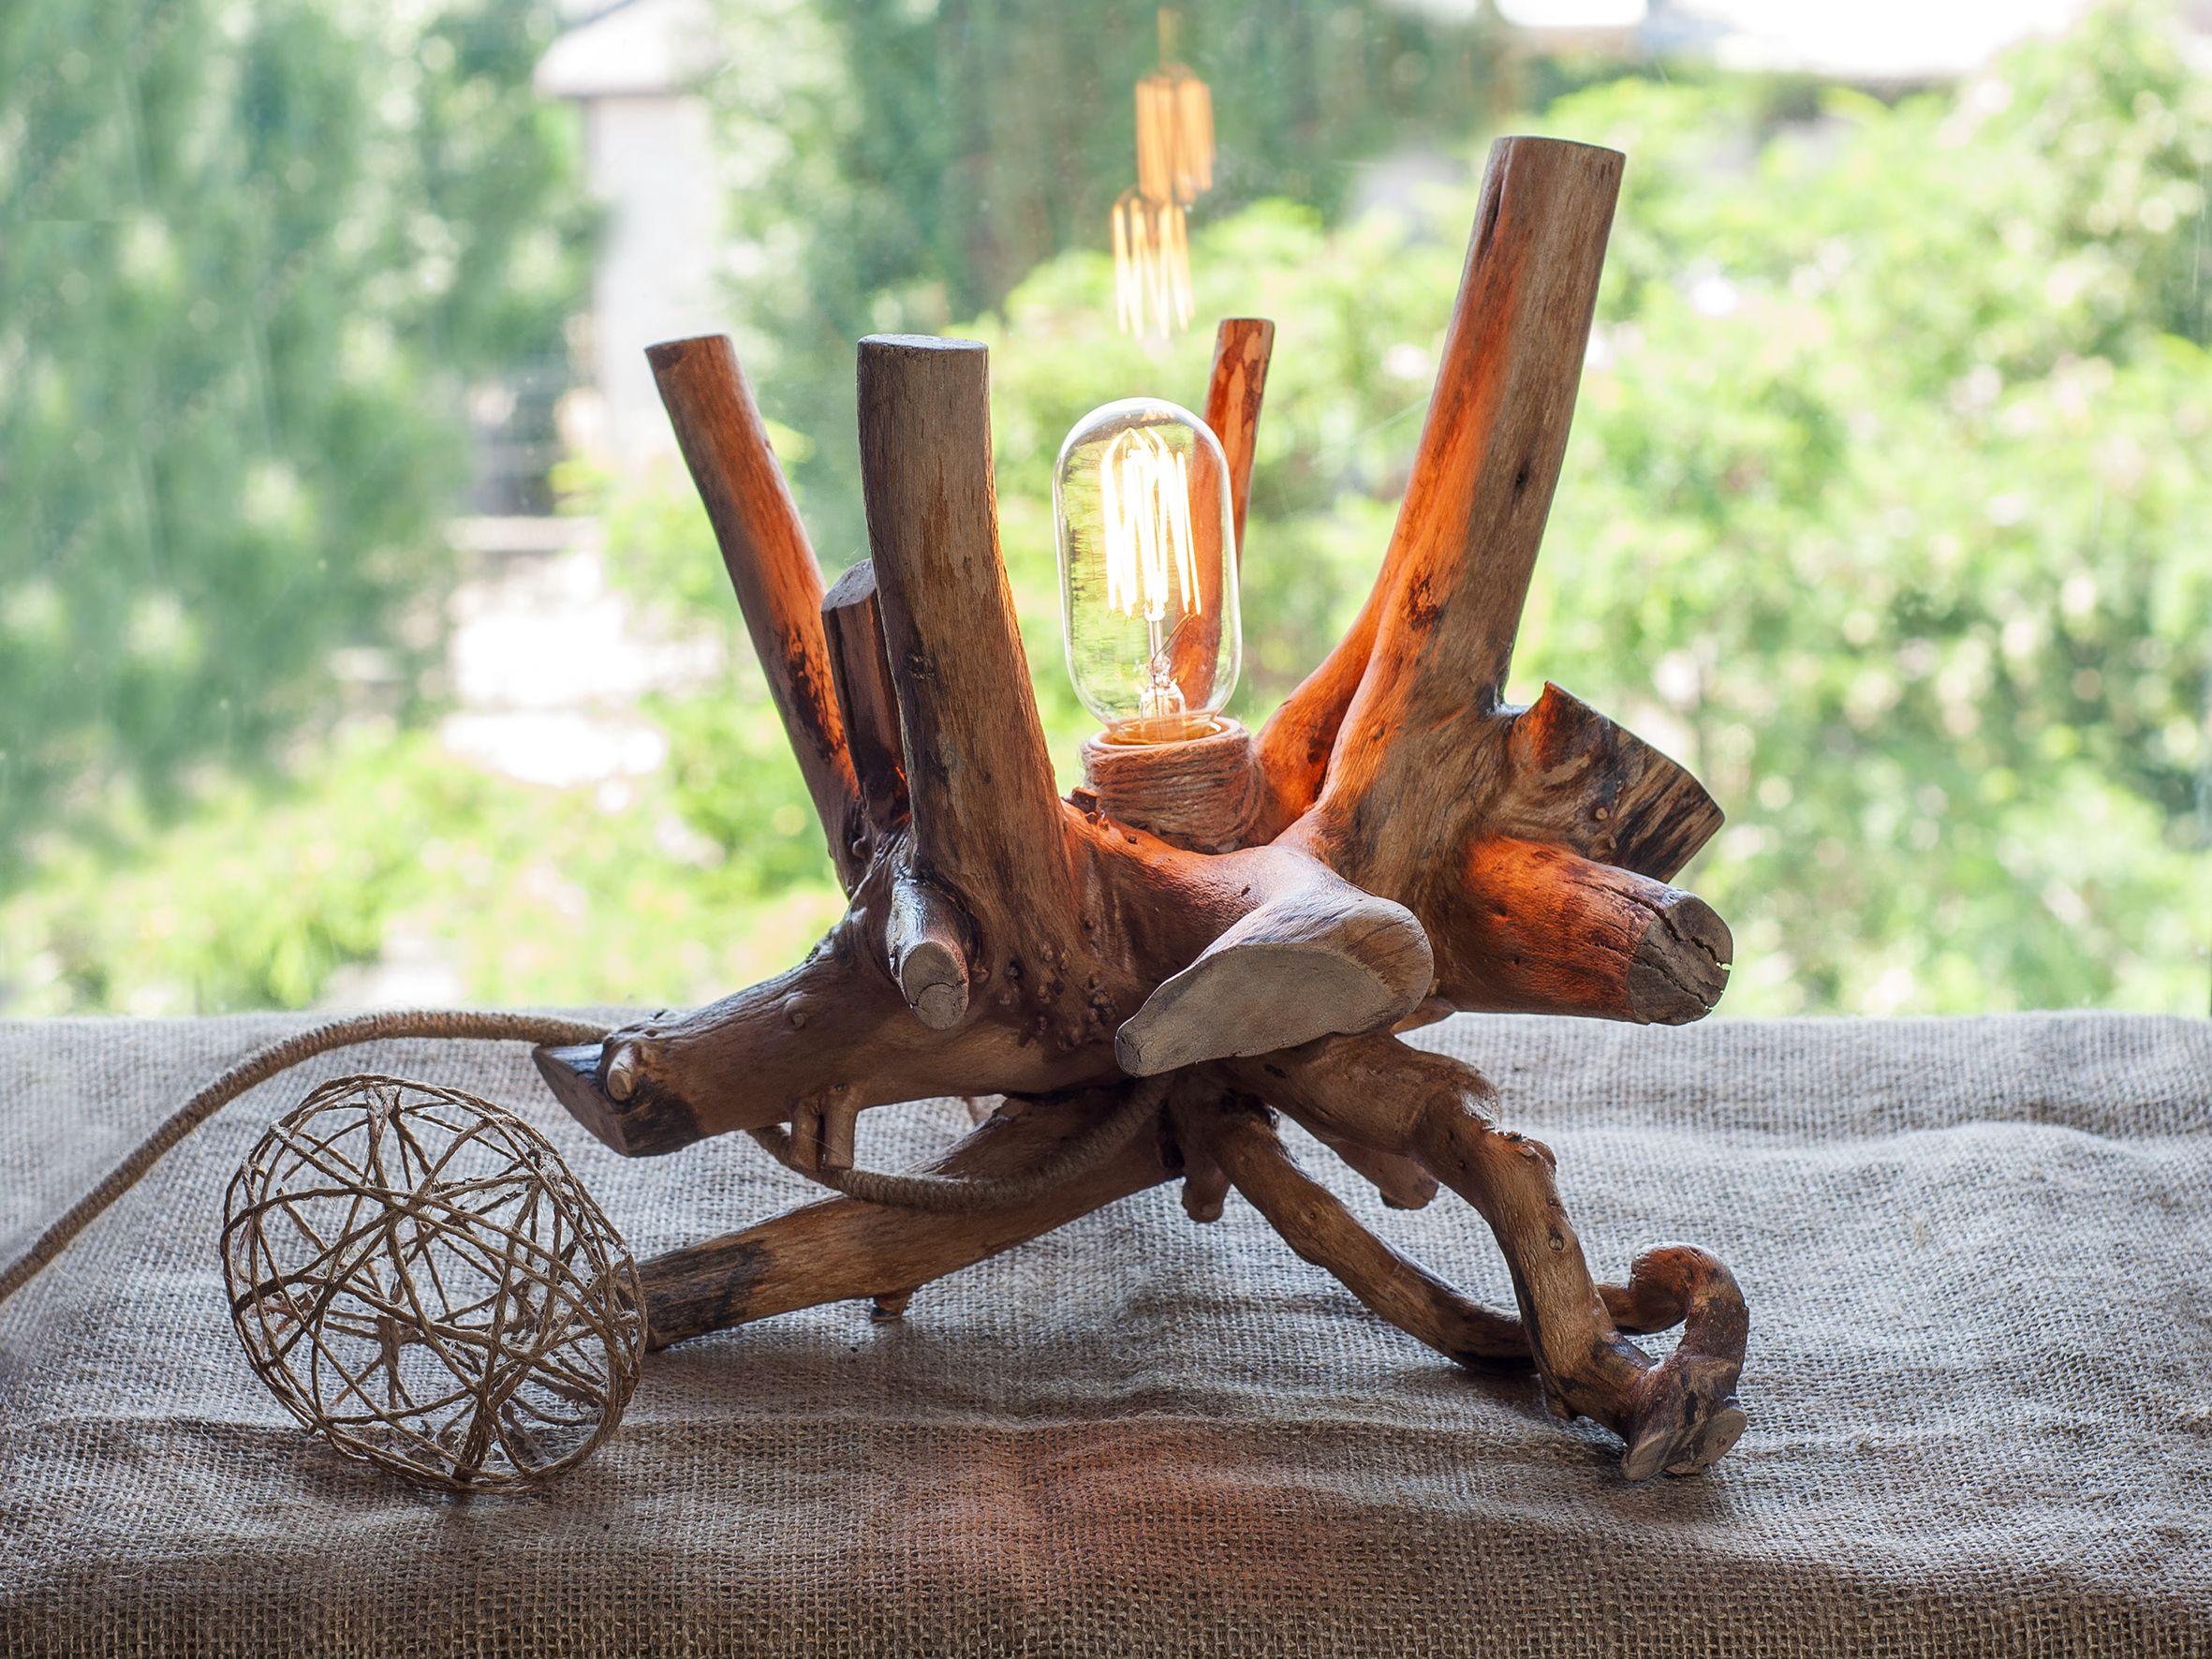 Driftwood lamp wood lamp rustic light edison light wood log lamp